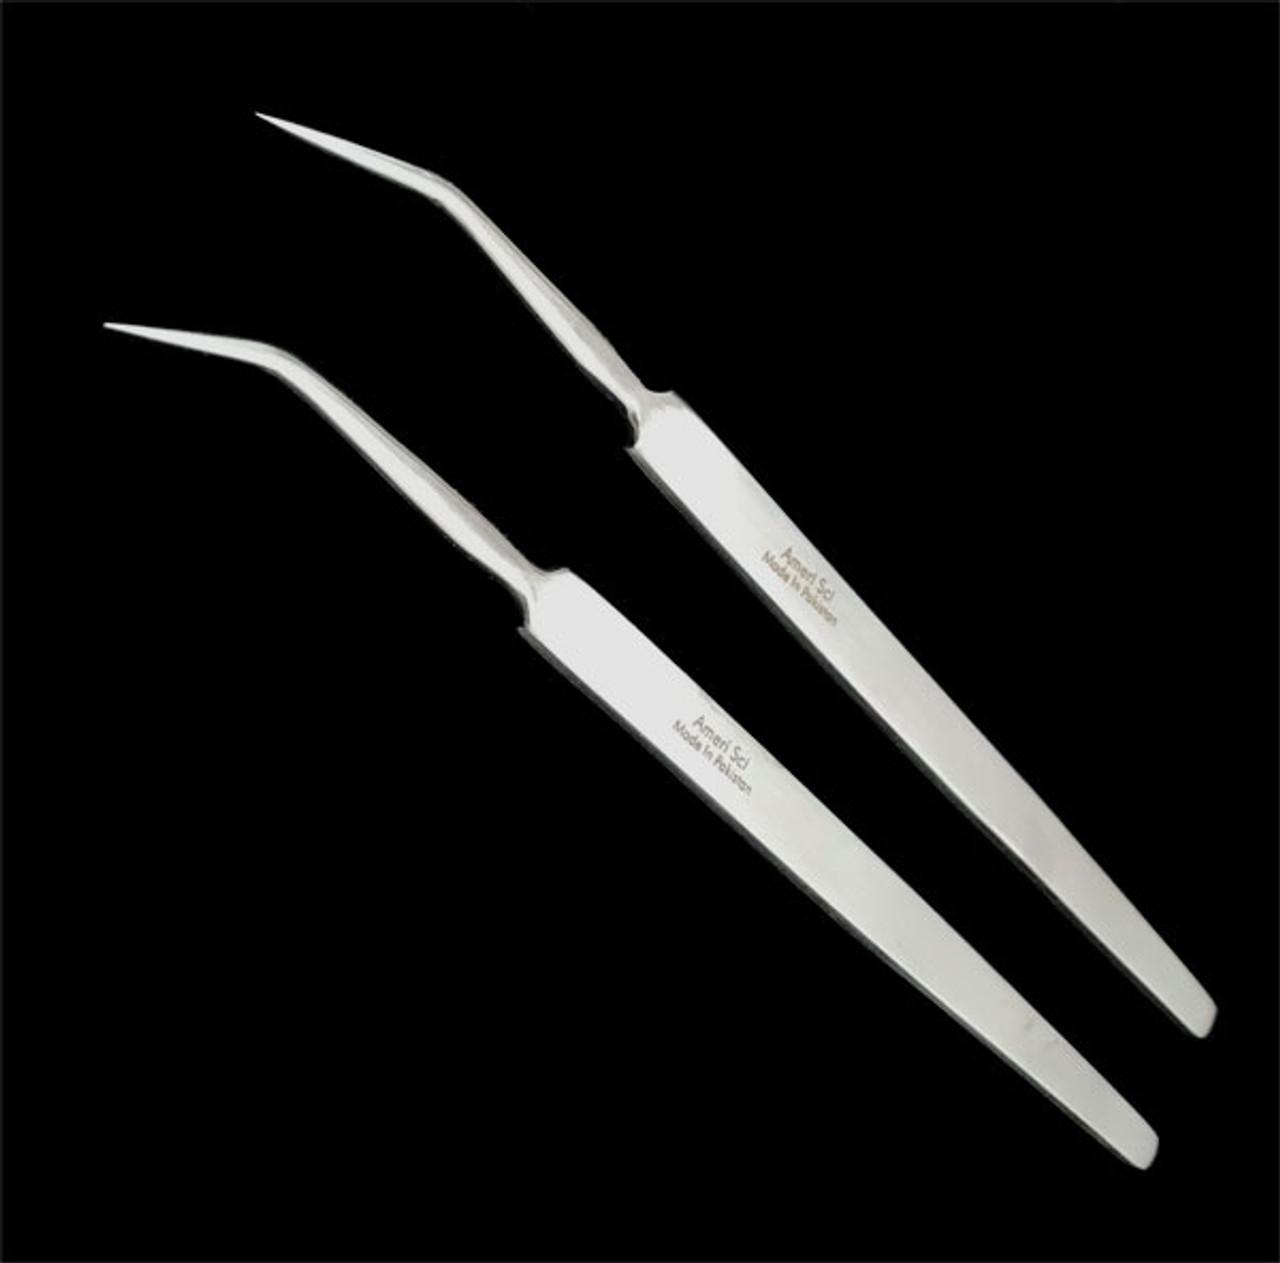 Dissection probe, teasing needle